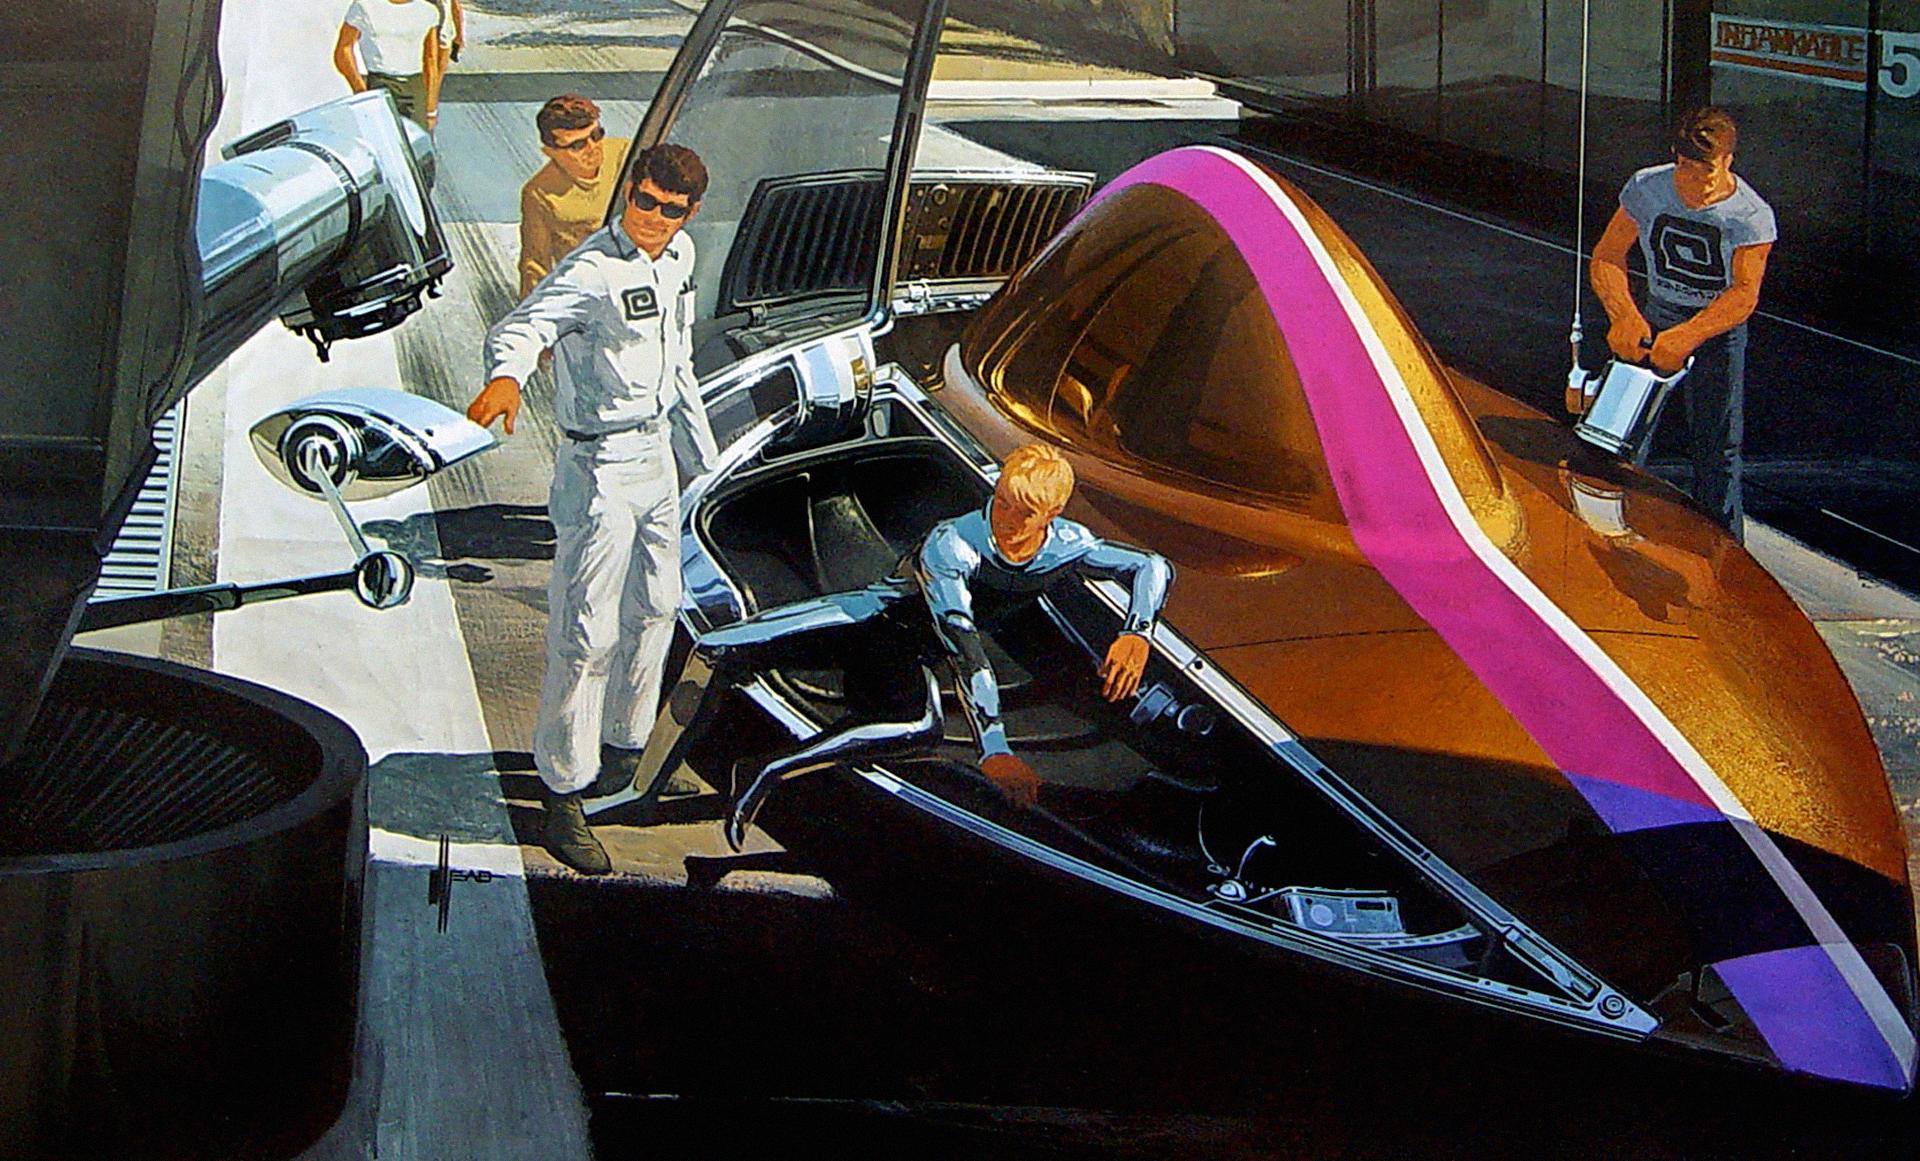 Кино, автопилот и батарейки: какими будут автомобили через 10-20 лет?. Фото 8